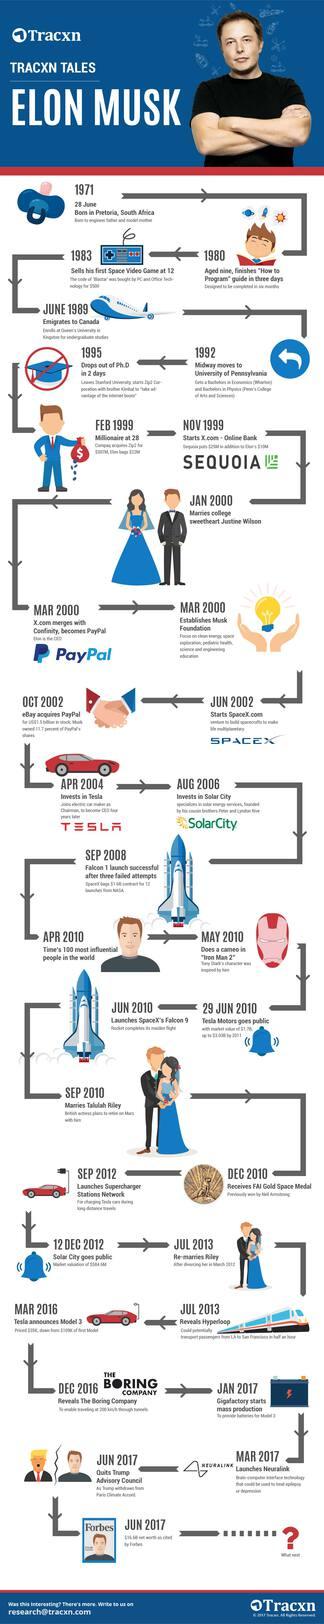 Elon Musk odyssey